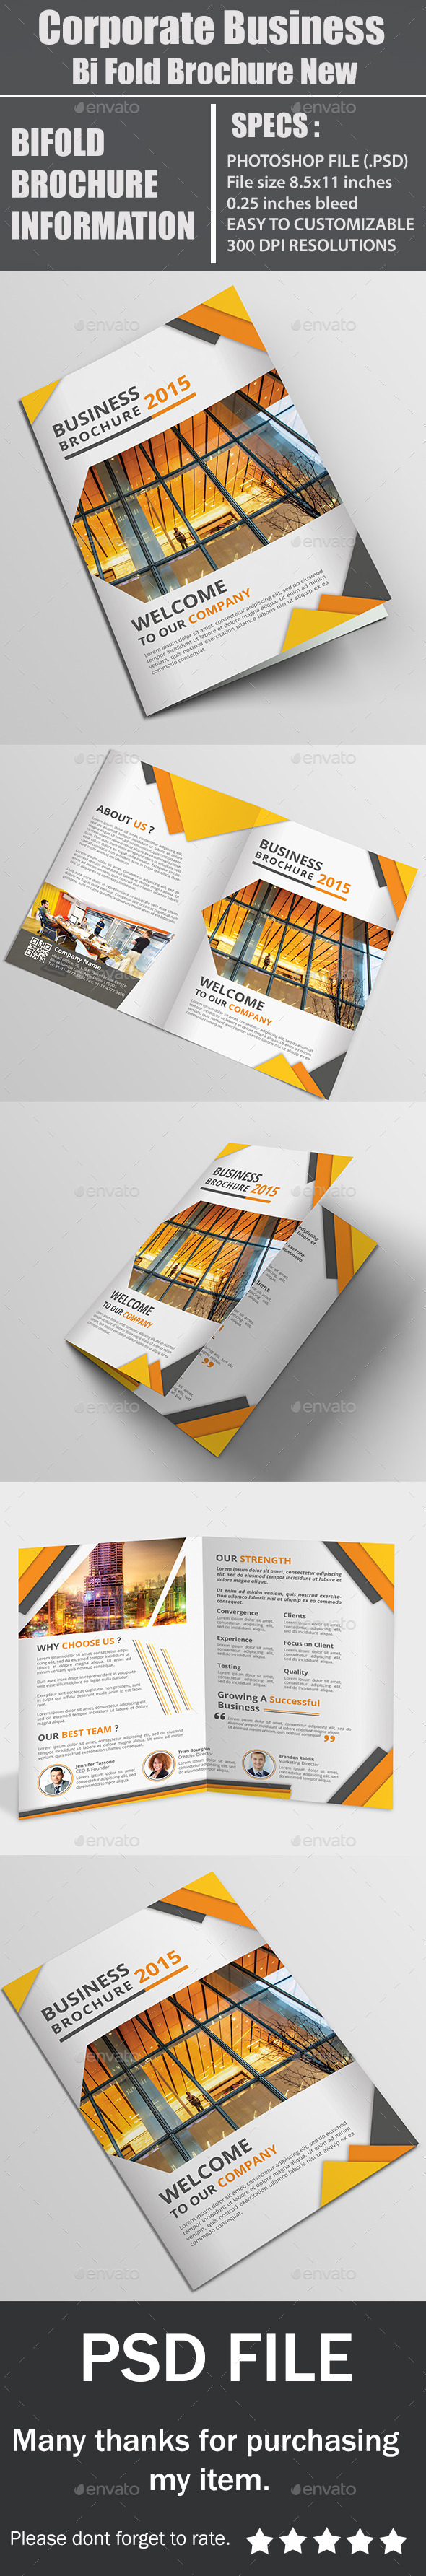 Corporate Business Bi Fold Brochure New - Corporate Brochures